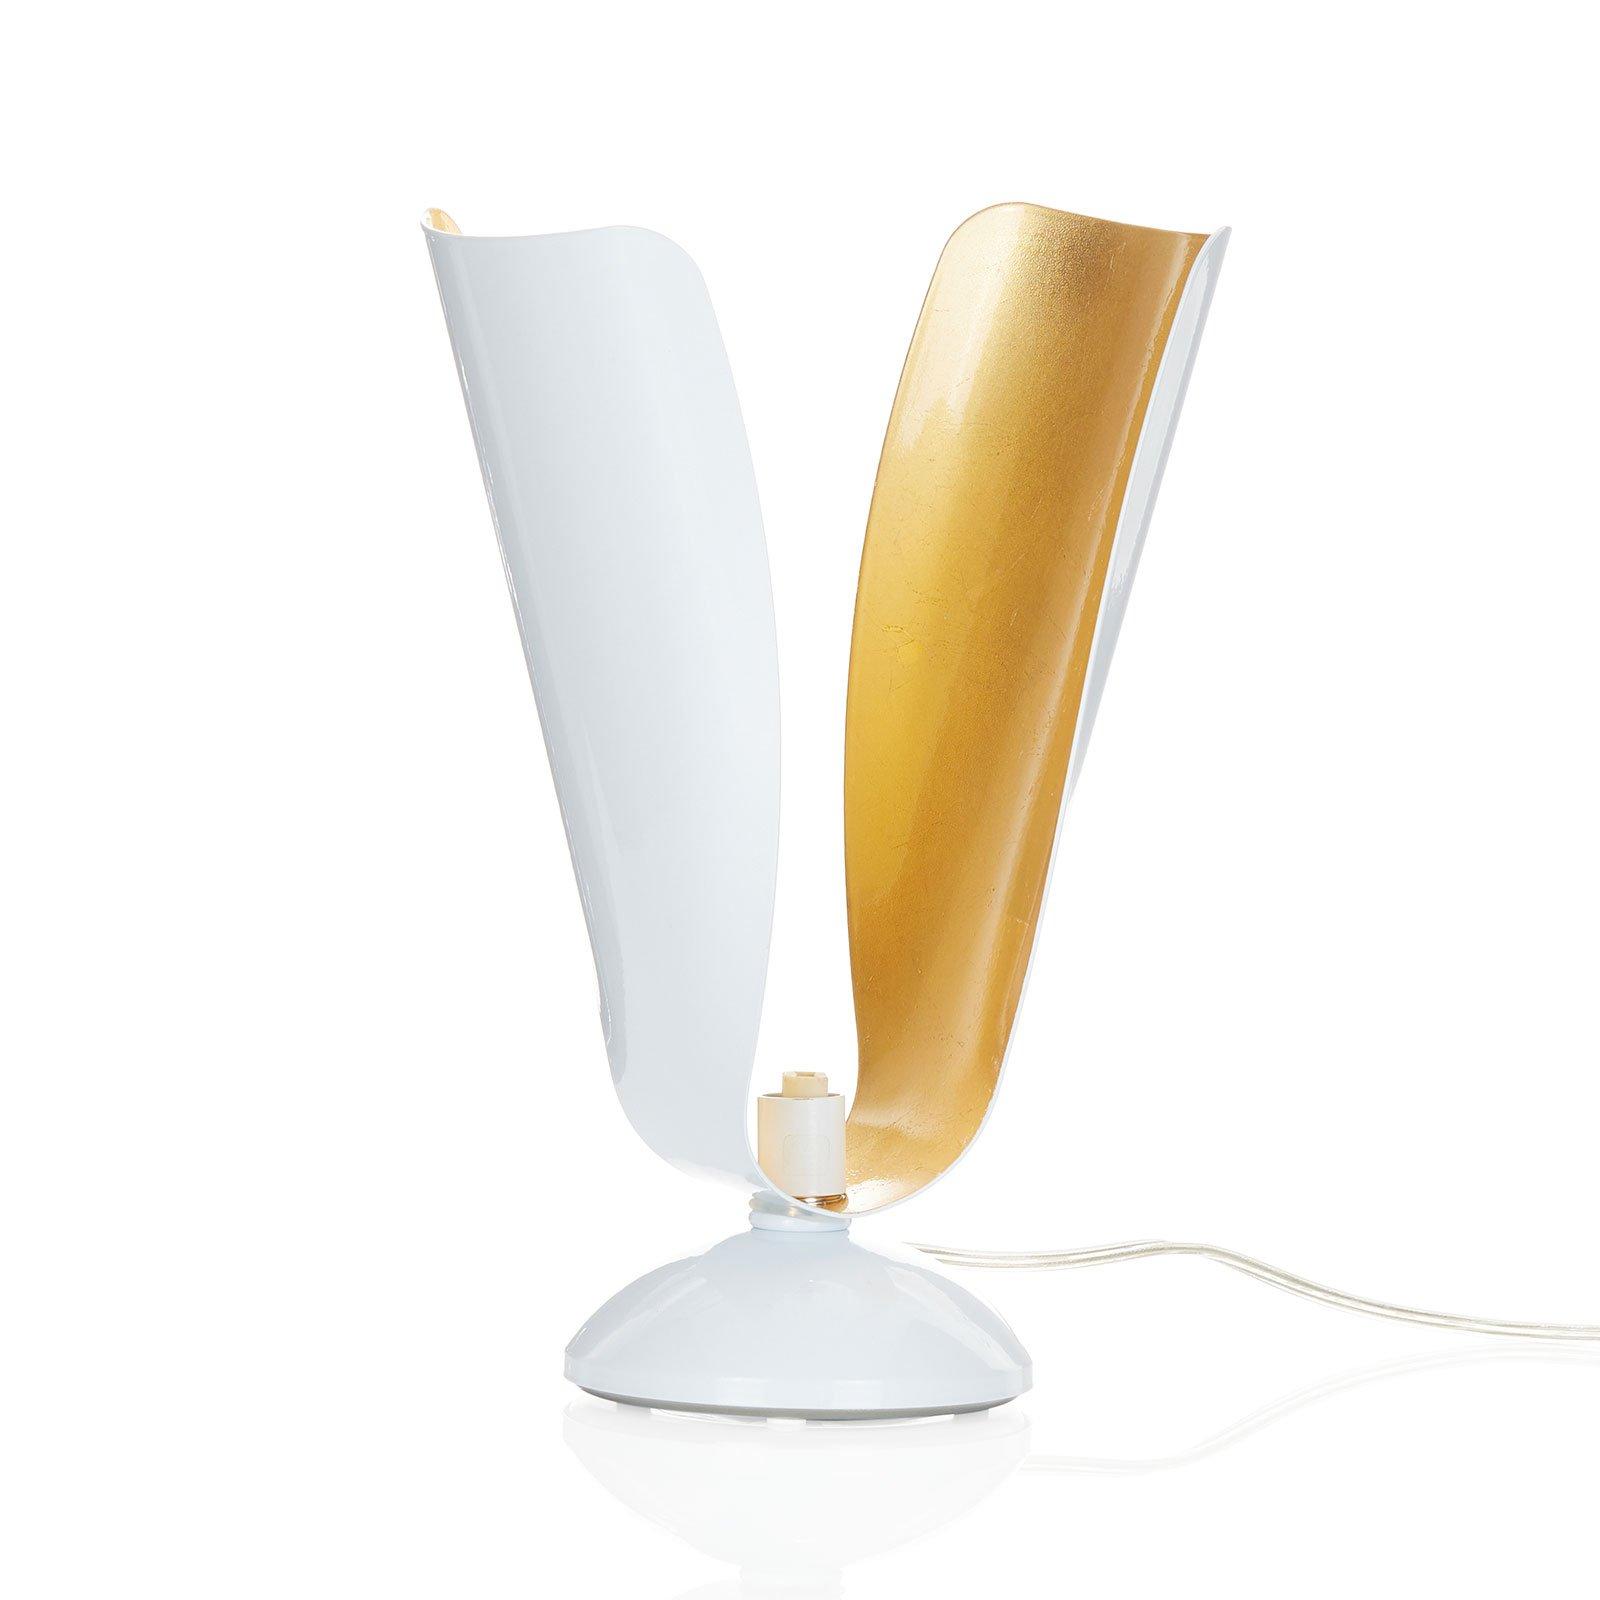 Bordlampe Tropic med bladgull